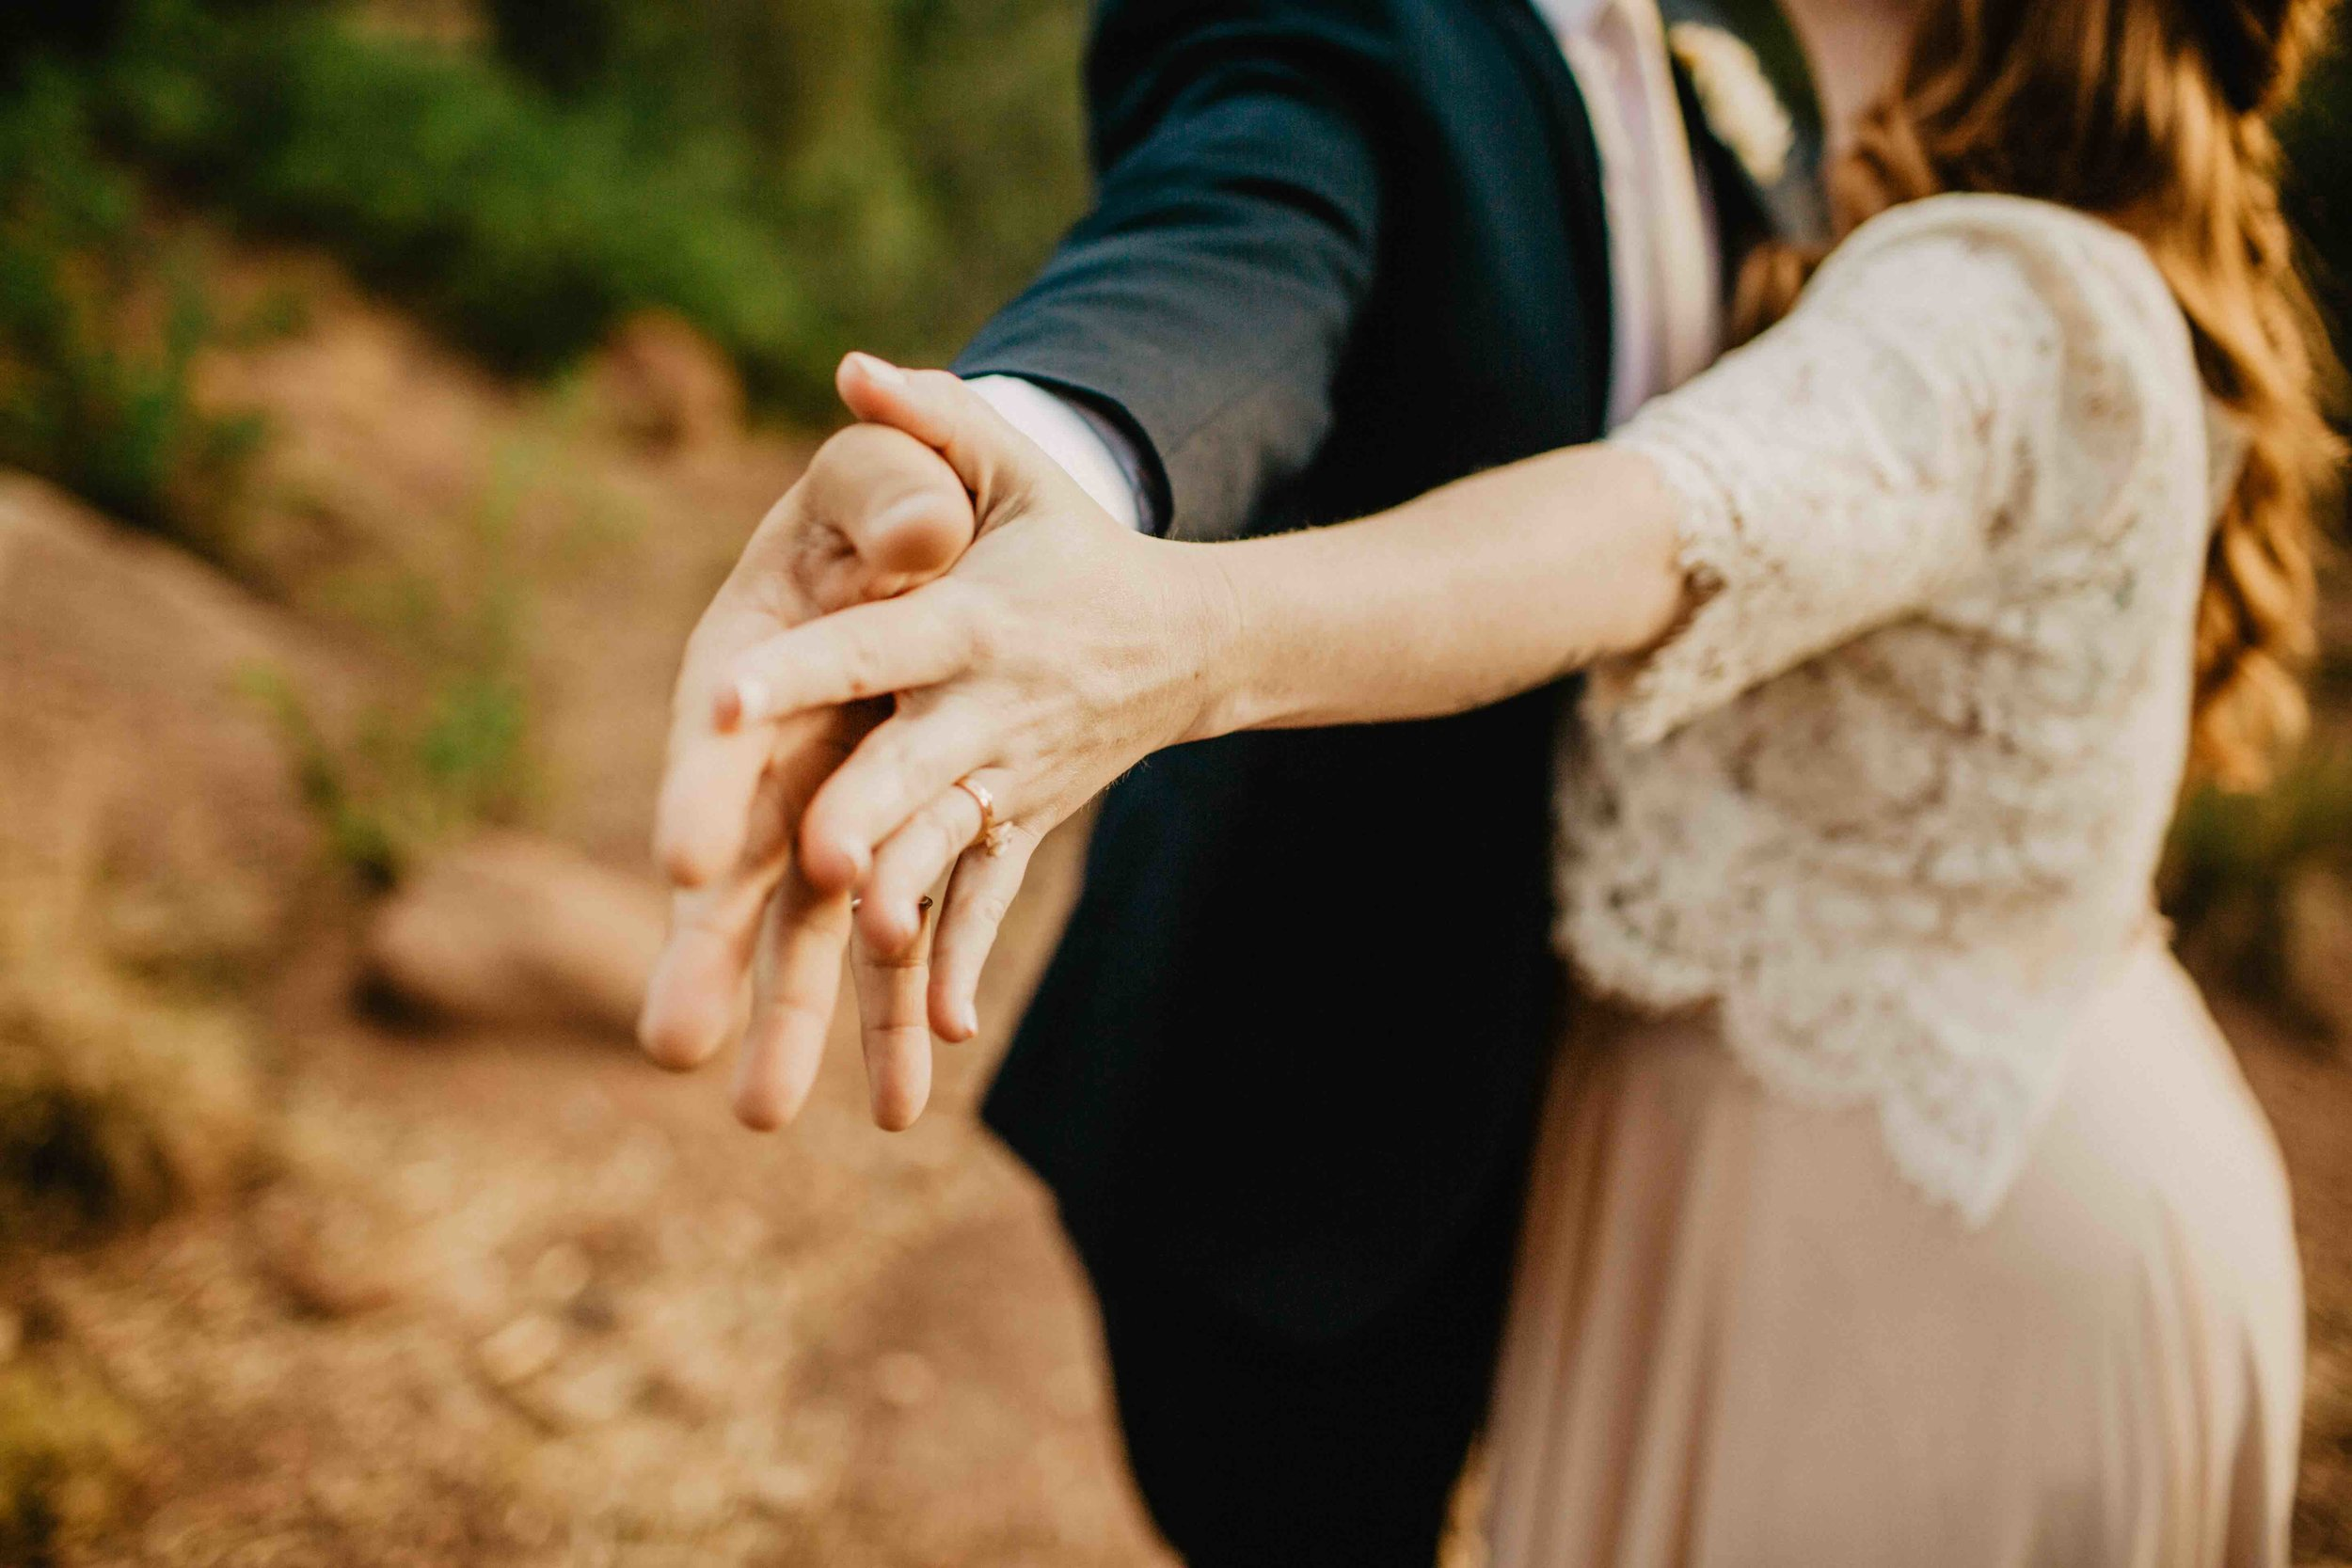 -colorado-wedding-photographer-denver-springs-vail-607A4218.jpeg